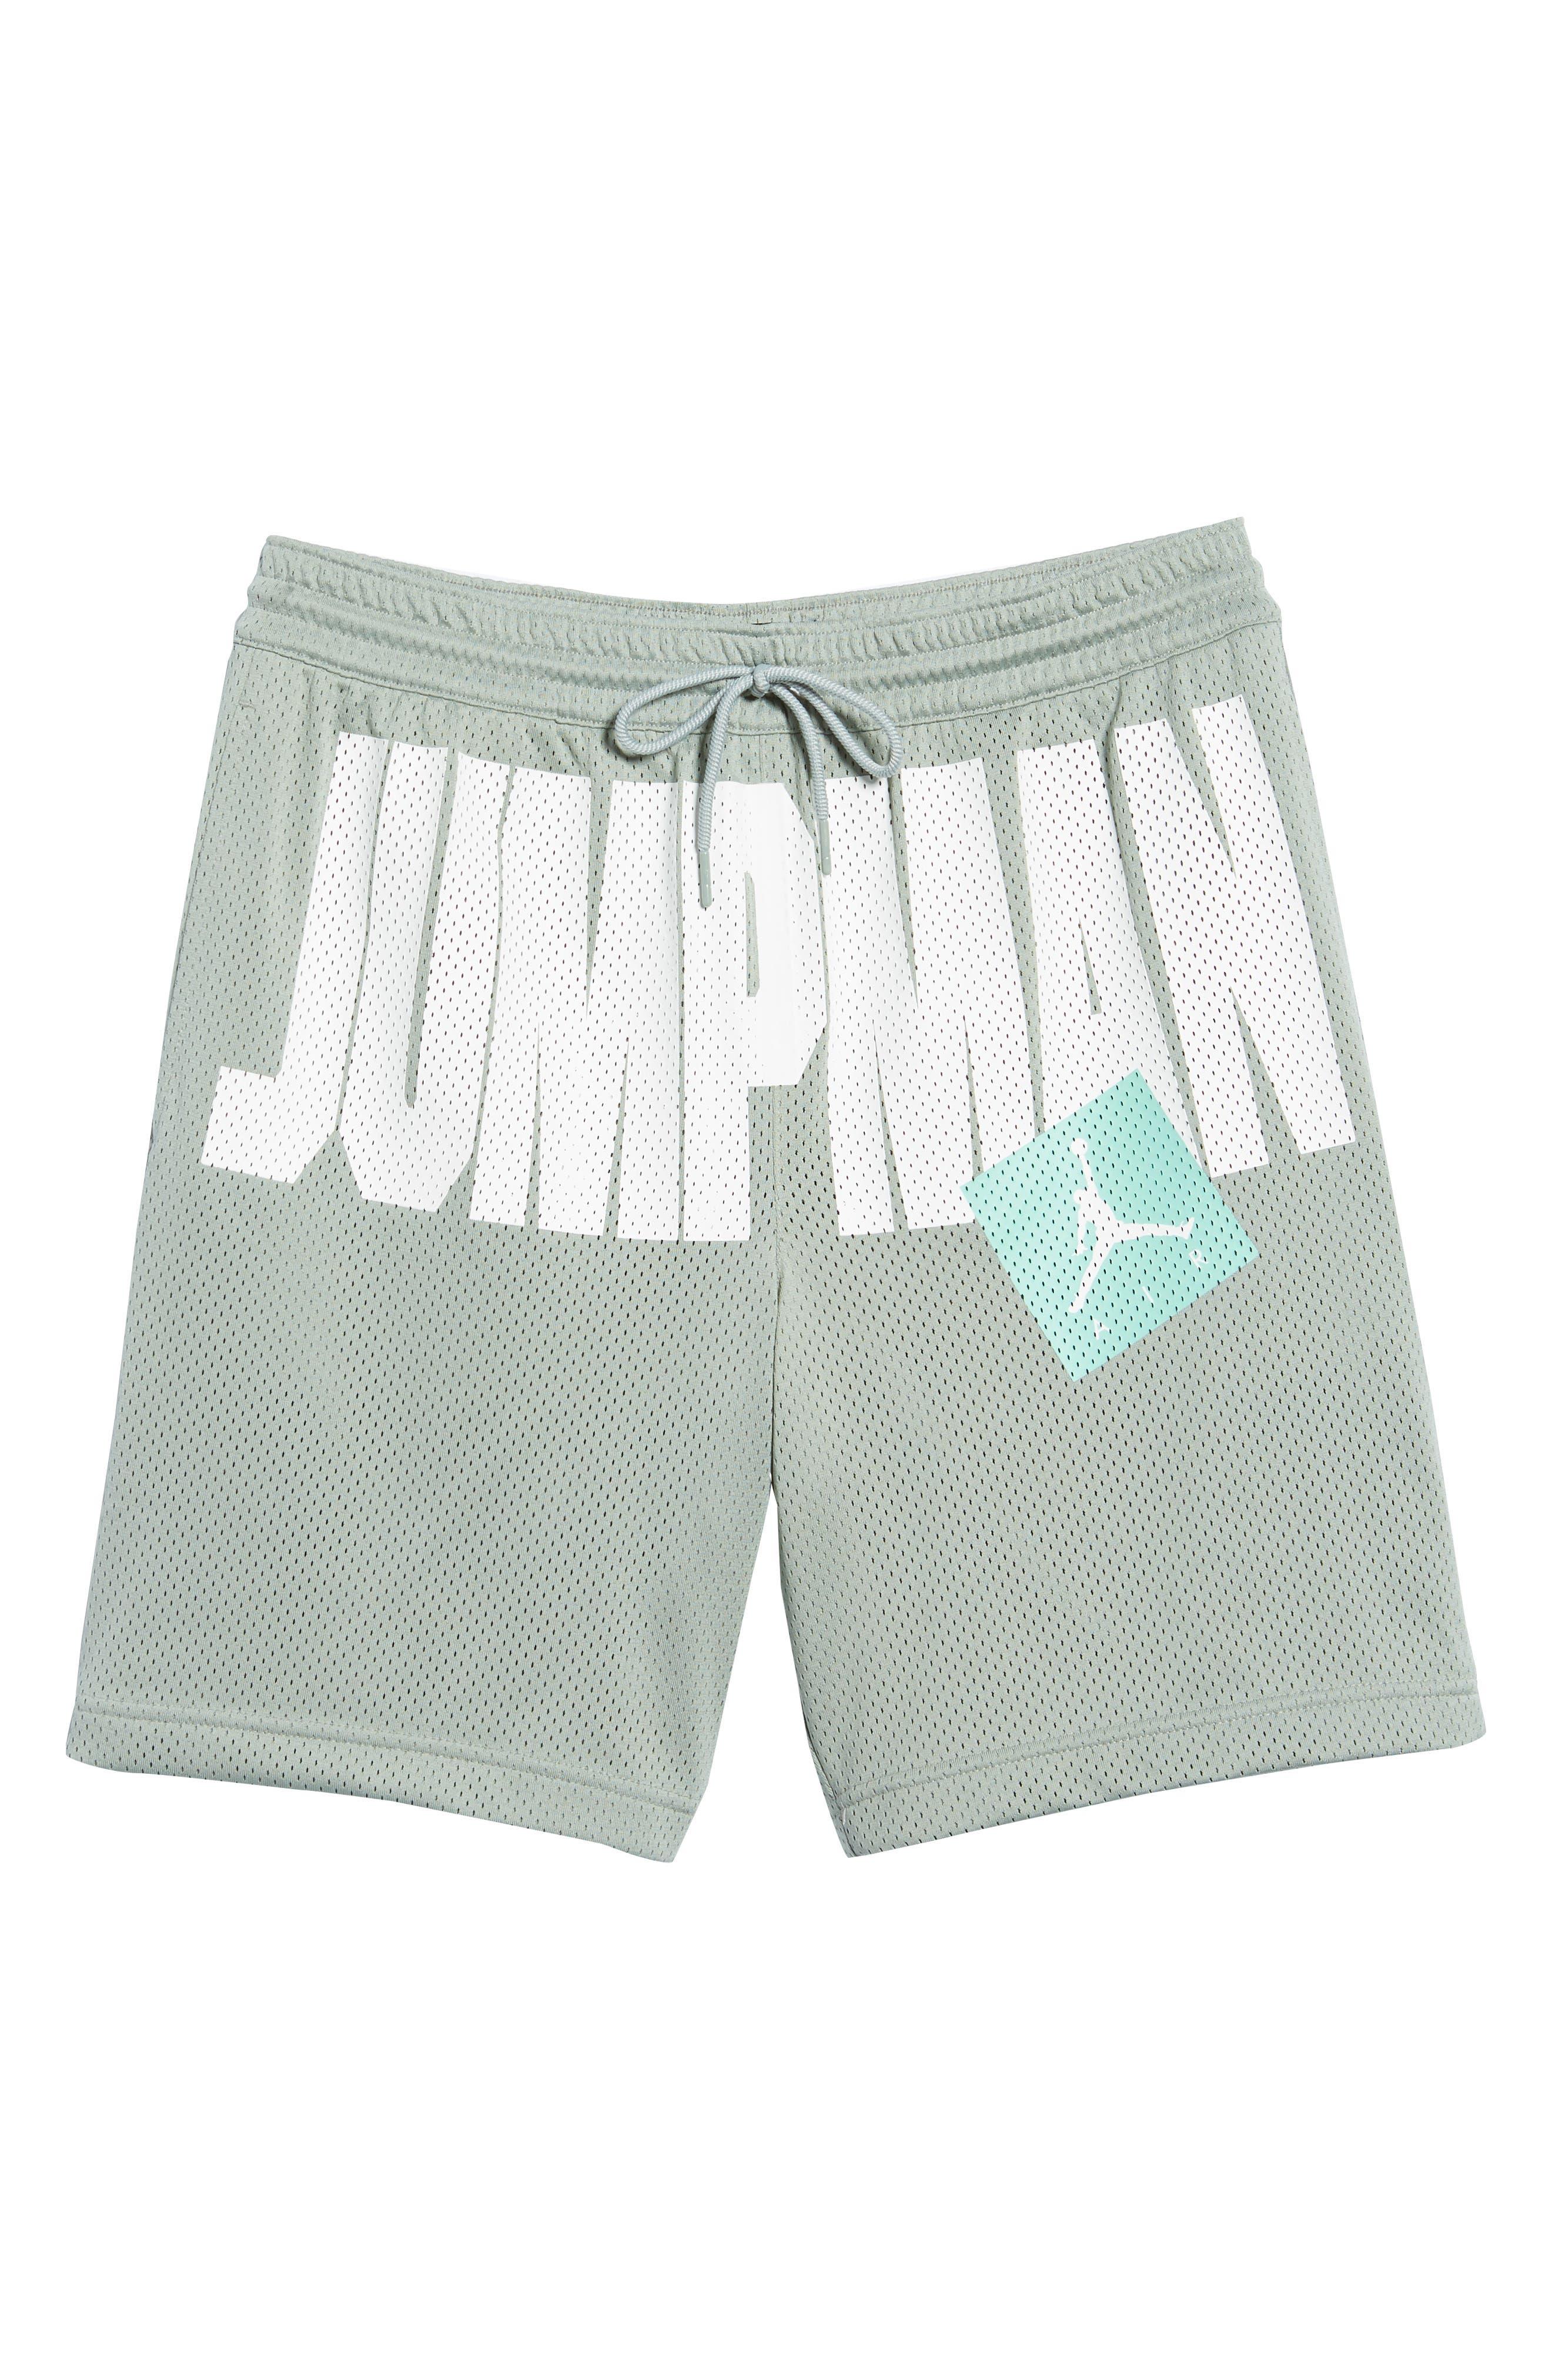 Nike Jumpman Air Mesh Shorts,                             Alternate thumbnail 6, color,                             MICA GREEN